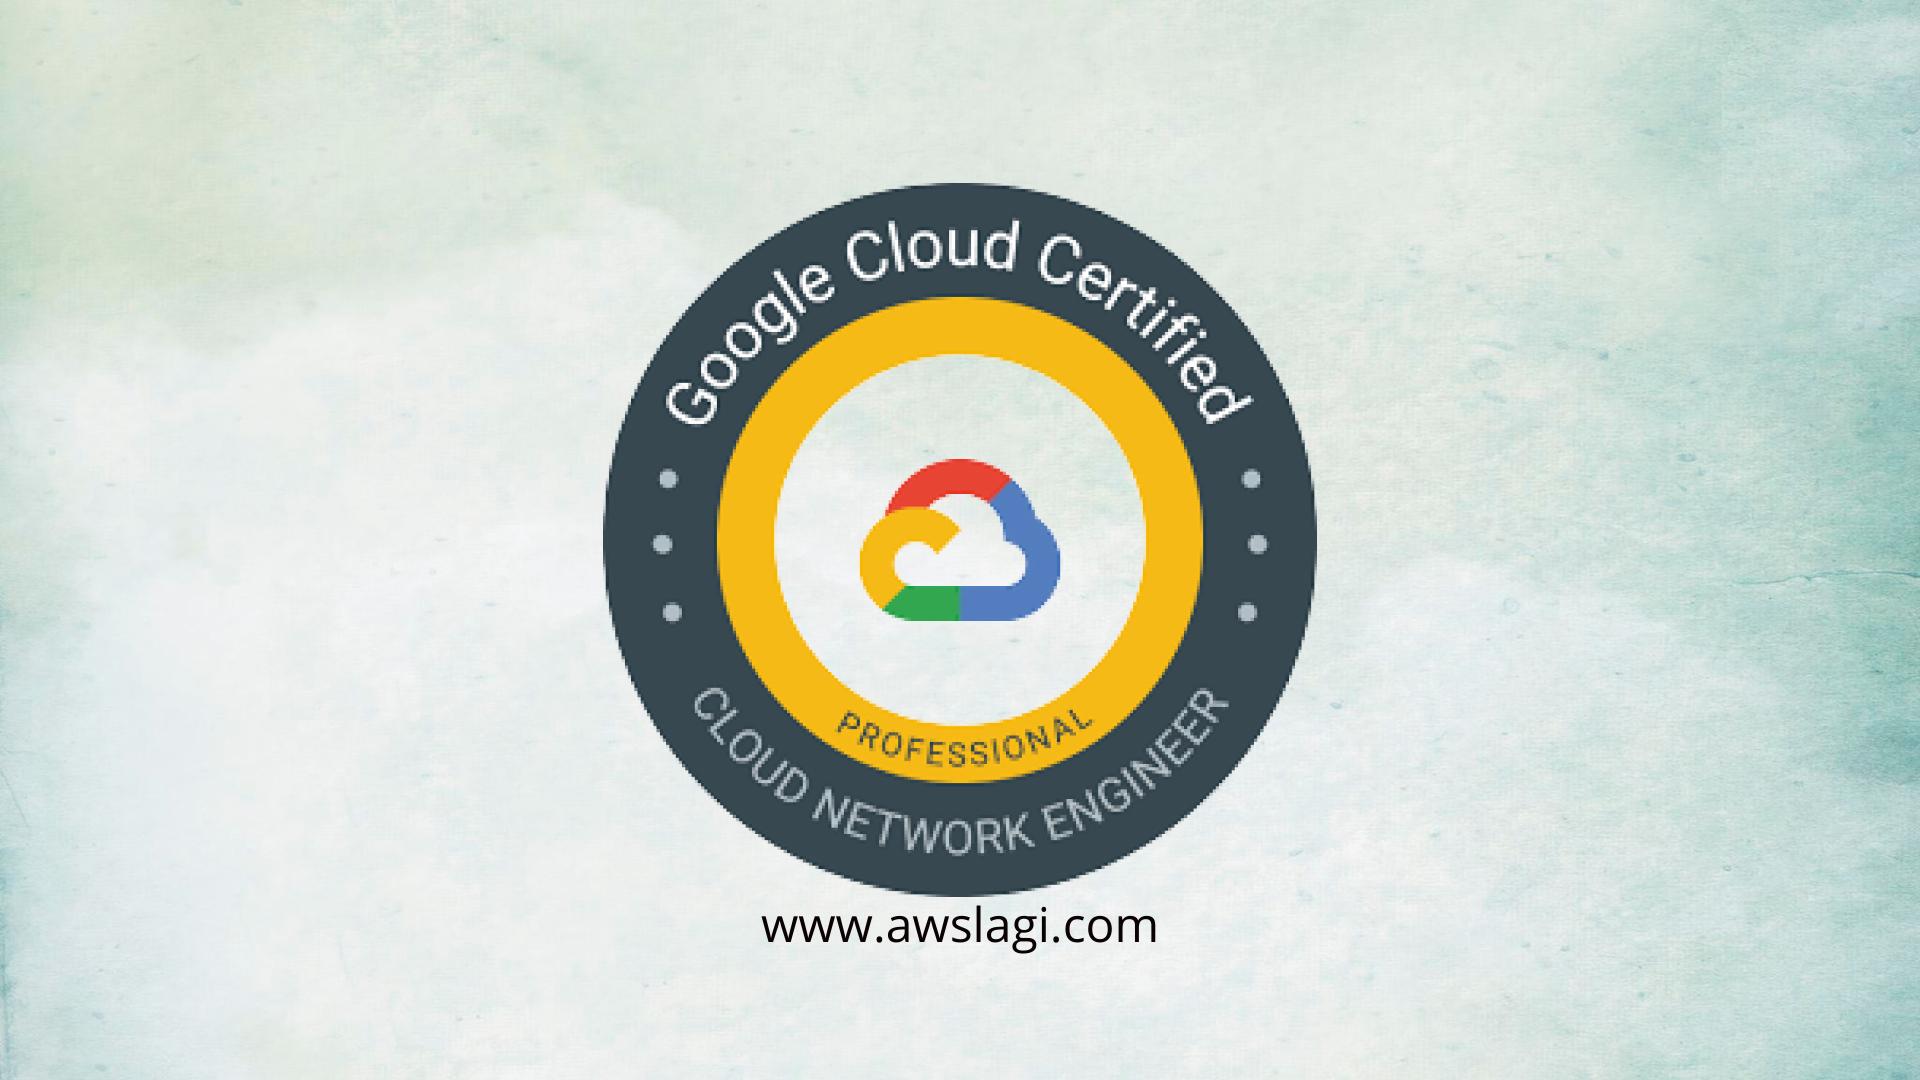 google-professional-network-engineer-actual-exam-logo